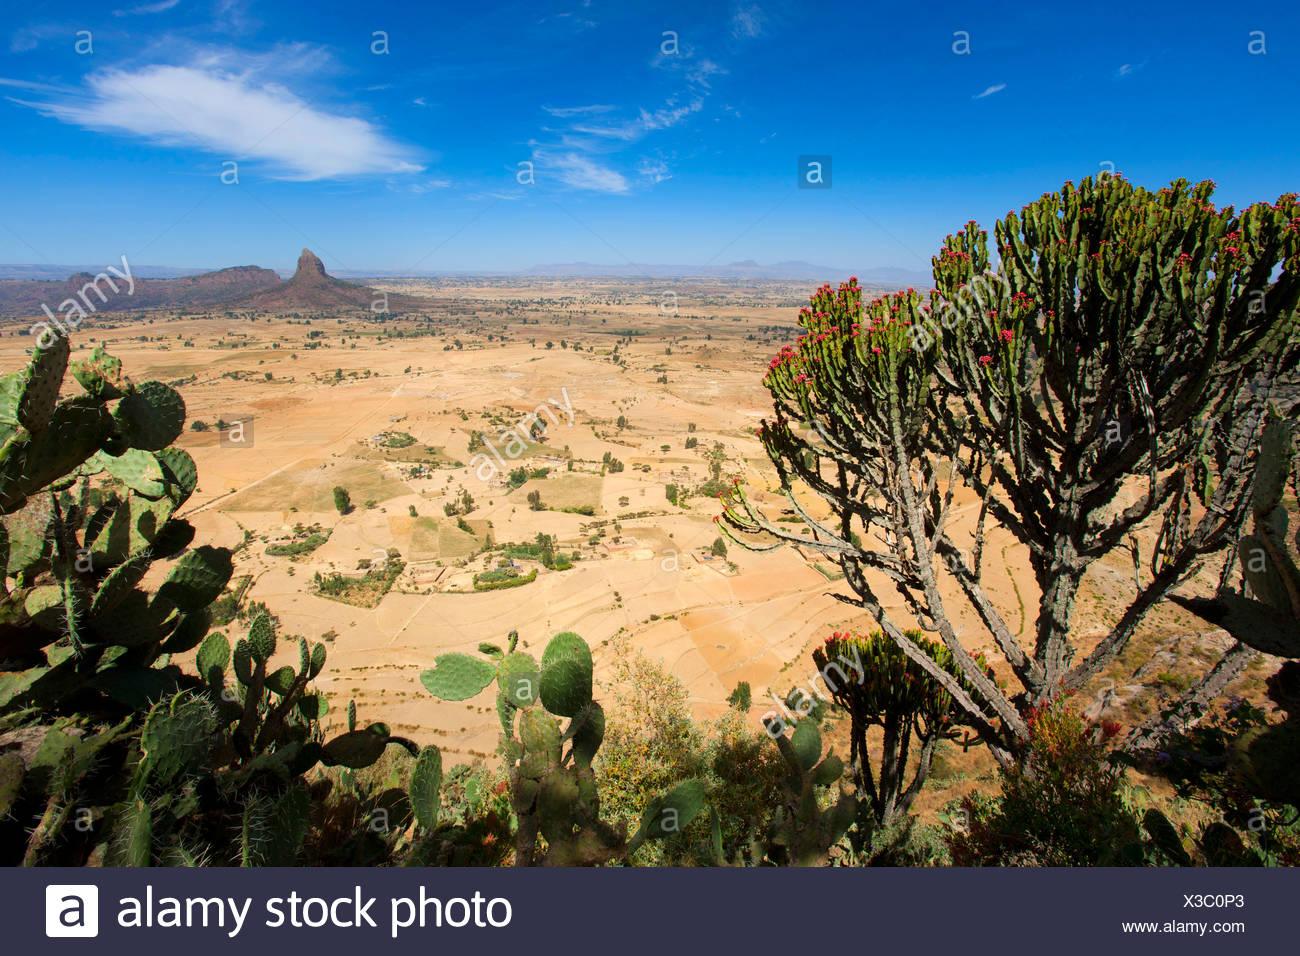 Gerealta, Africa, Ethiopia, highland, view point, cacti - Stock Image